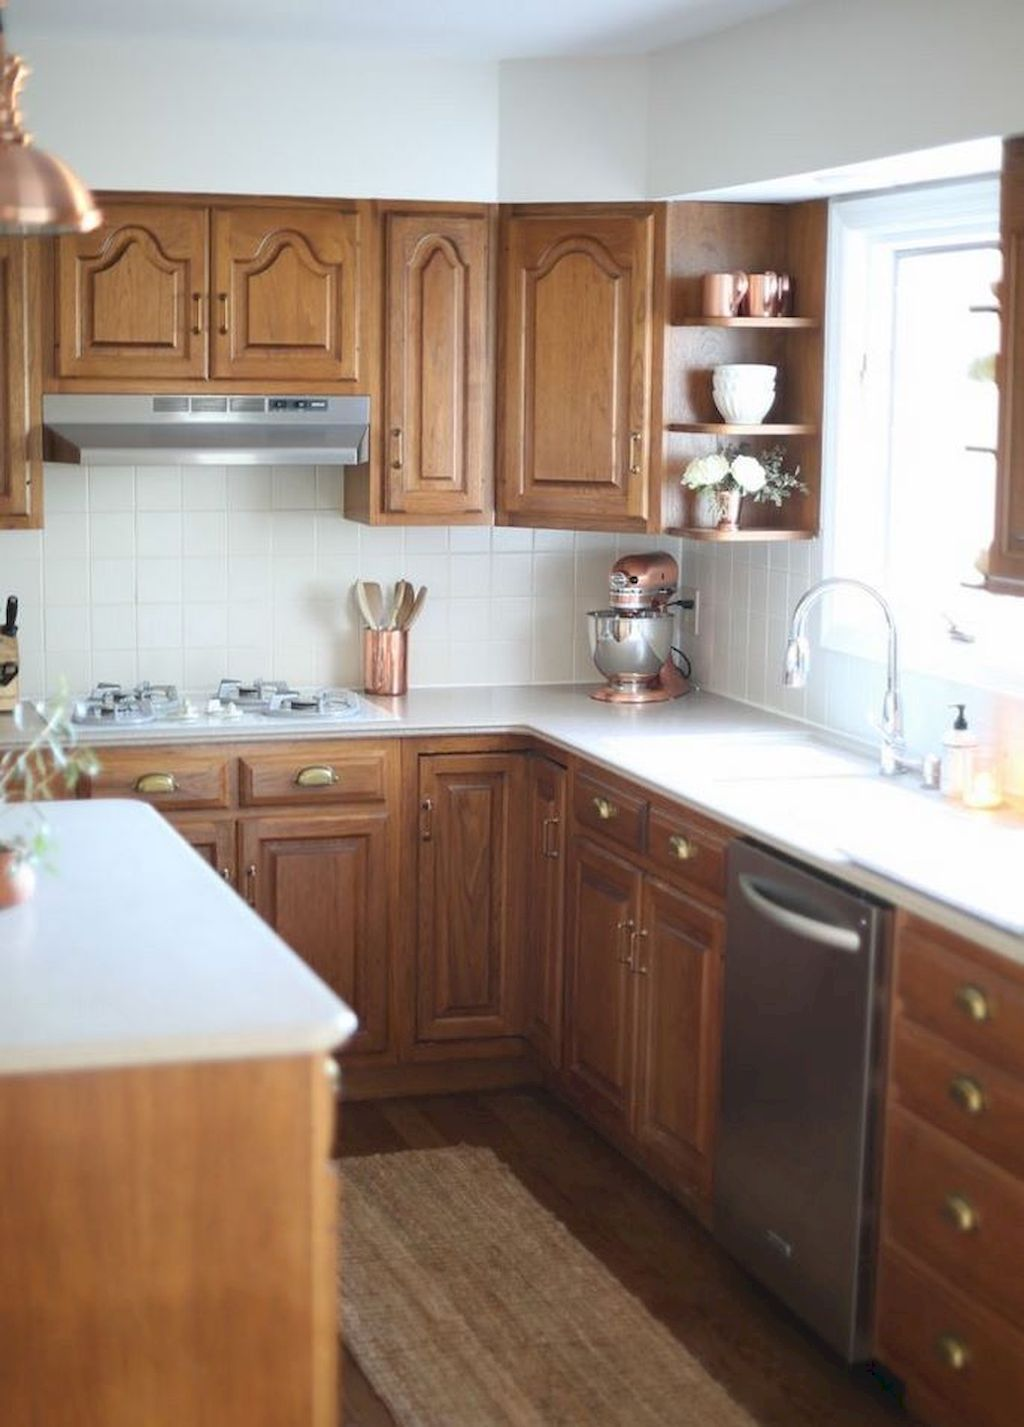 65 Farmhouse Kitchen Backsplash Design Ideas